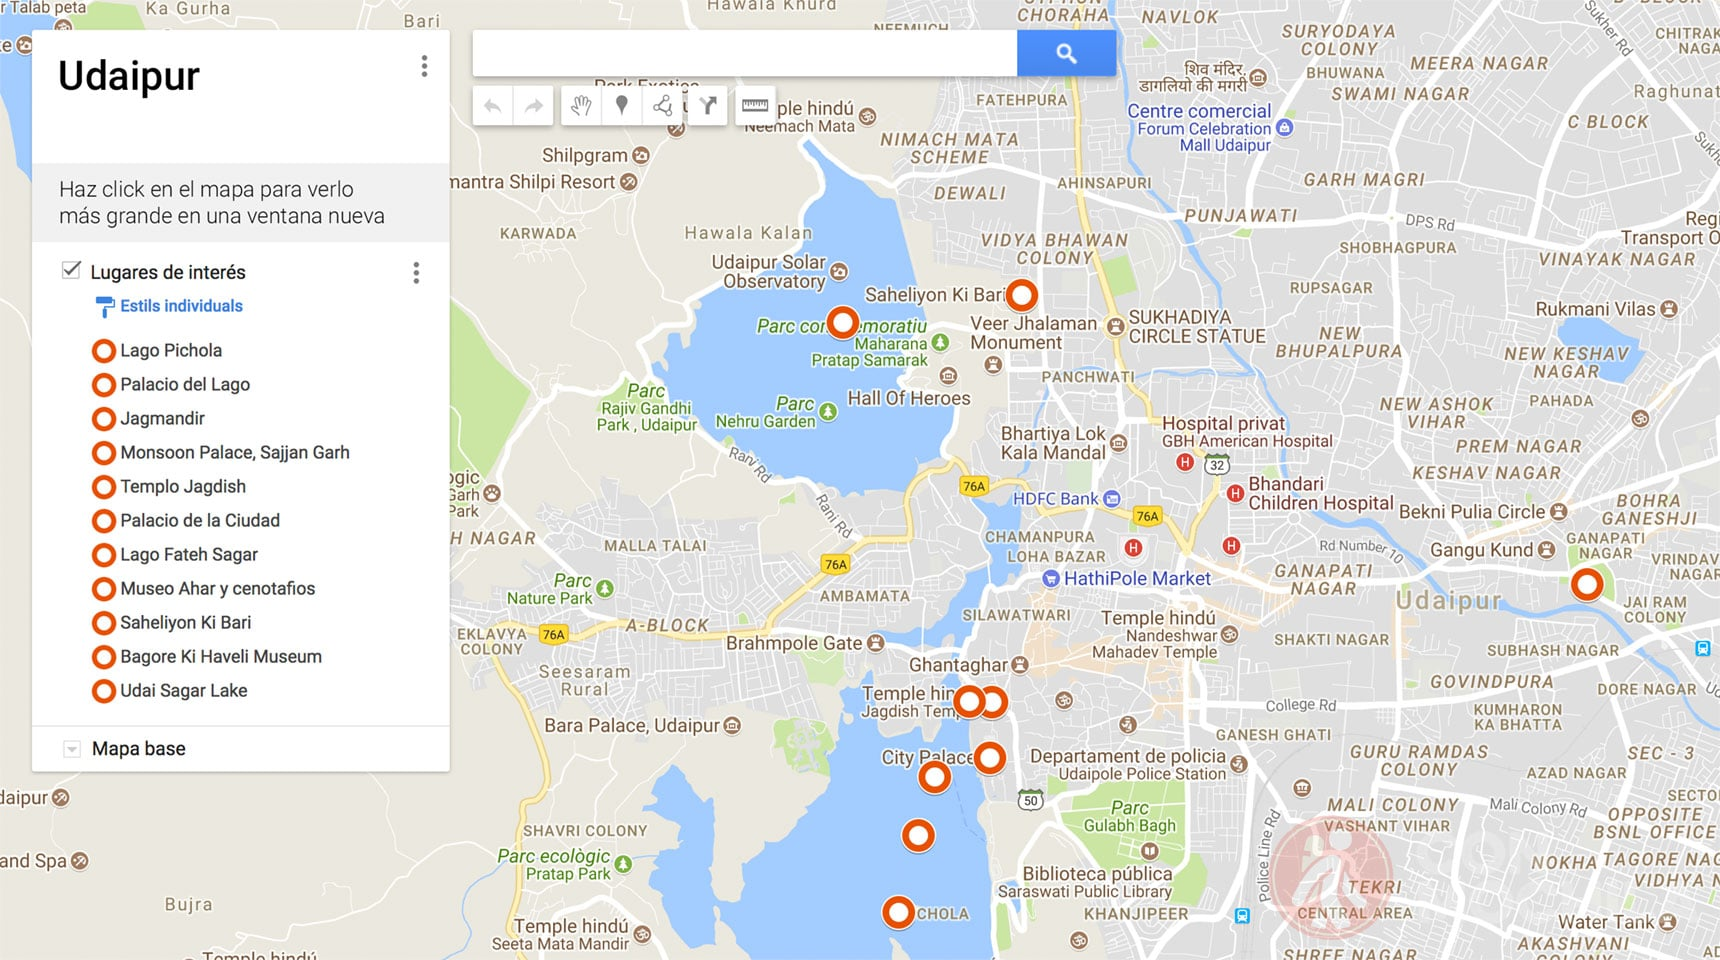 Mapa de Udaipur